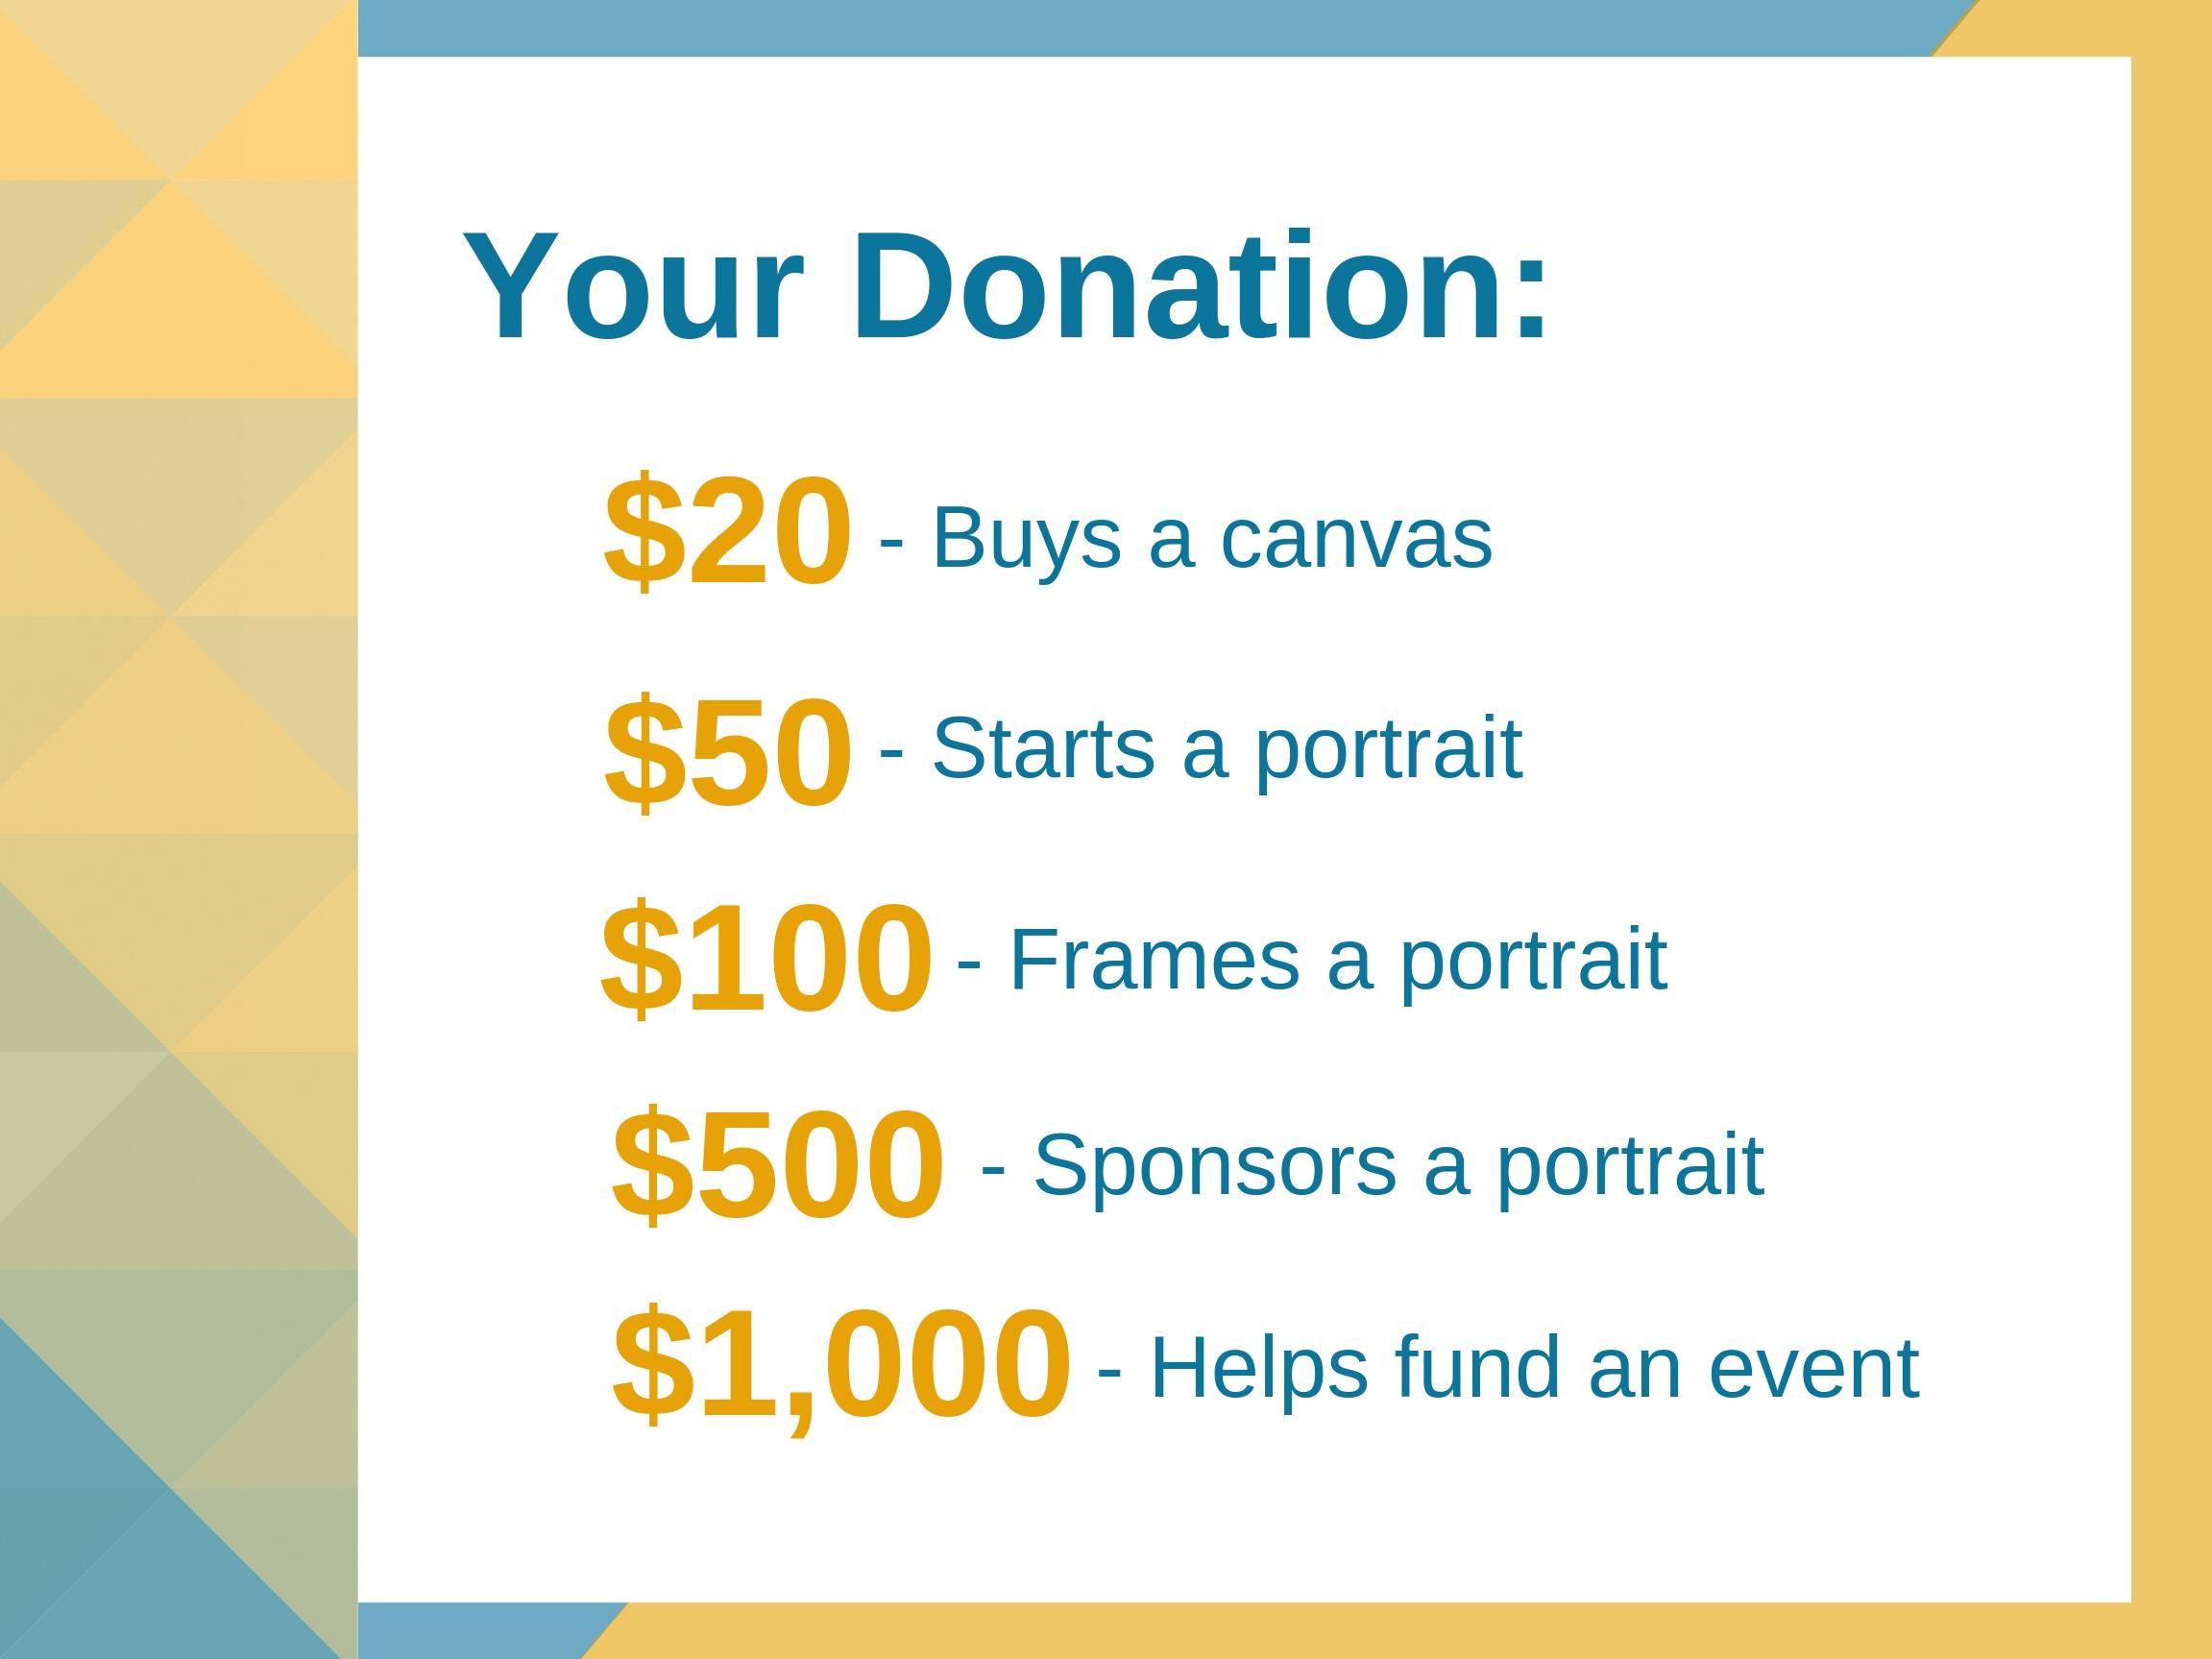 Copy+of+donate+image.jpg